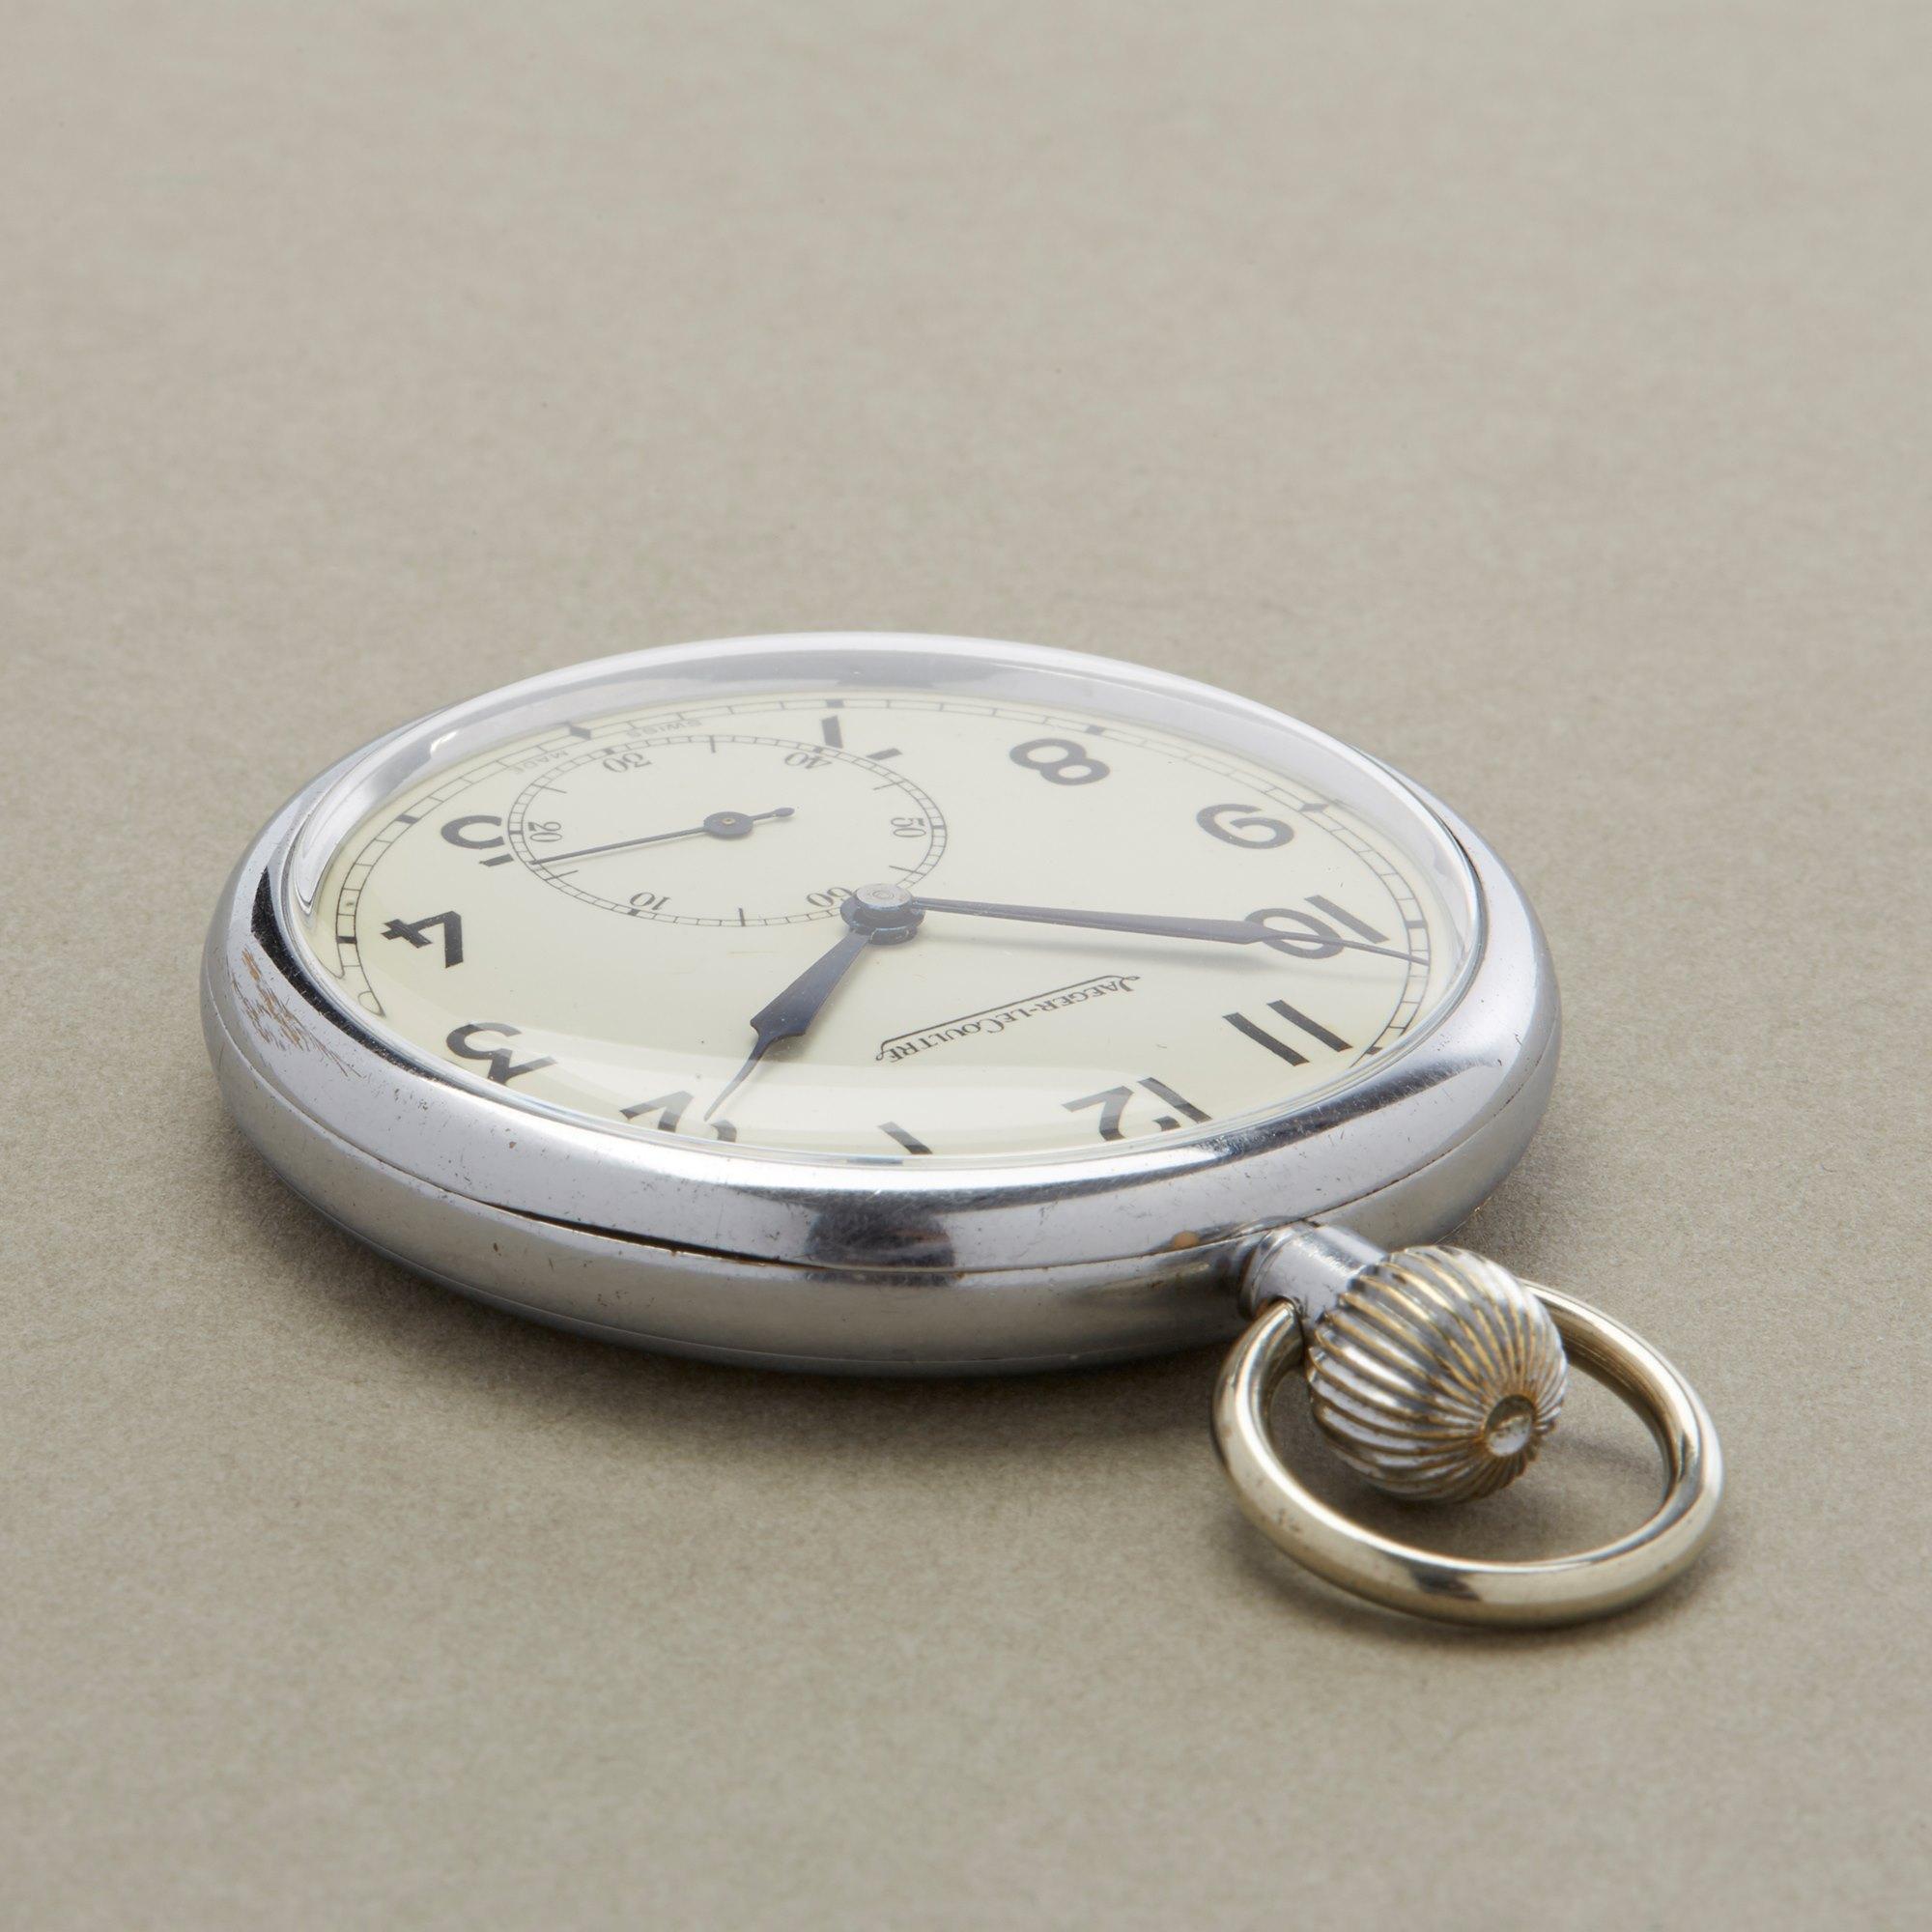 Jaeger-LeCoultre Pocket Watch Navigators 6E/50 Stainless Steel 467/2